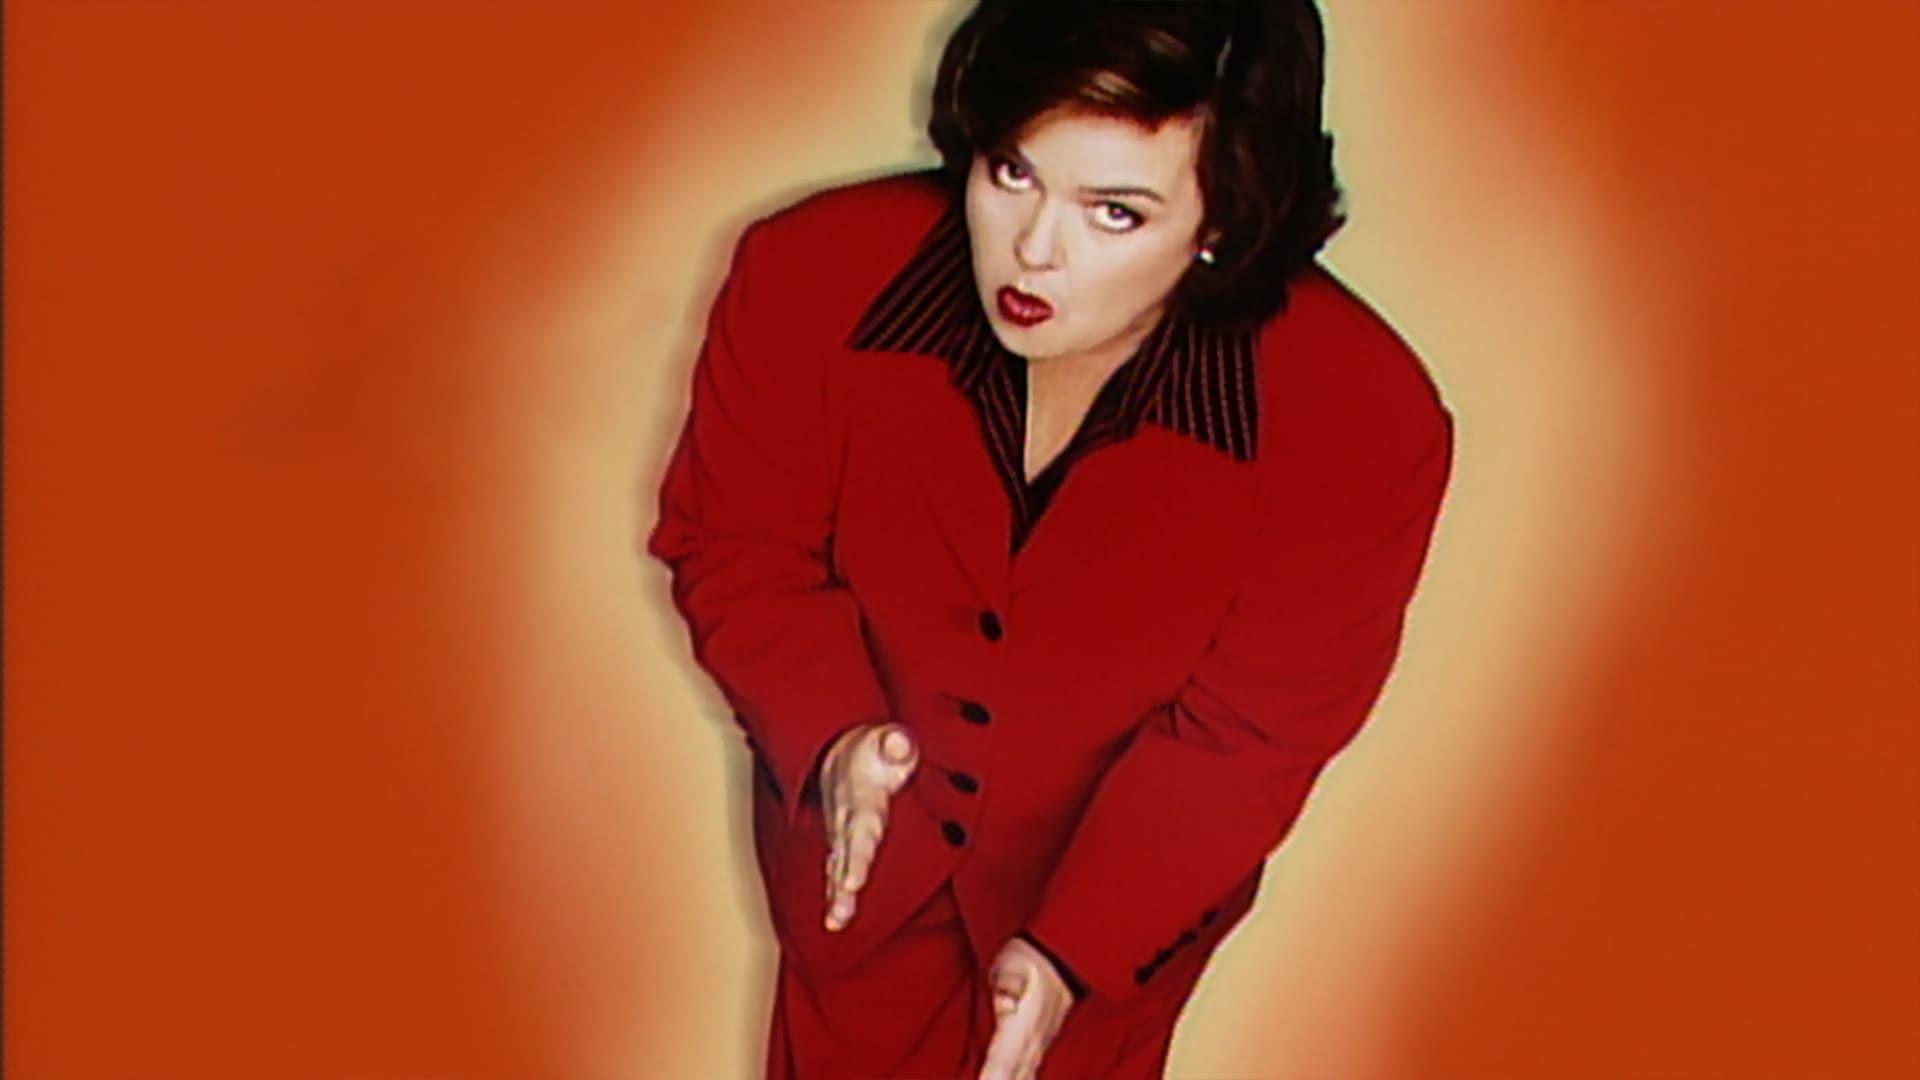 Rosie O'Donnell: December 14, 1996